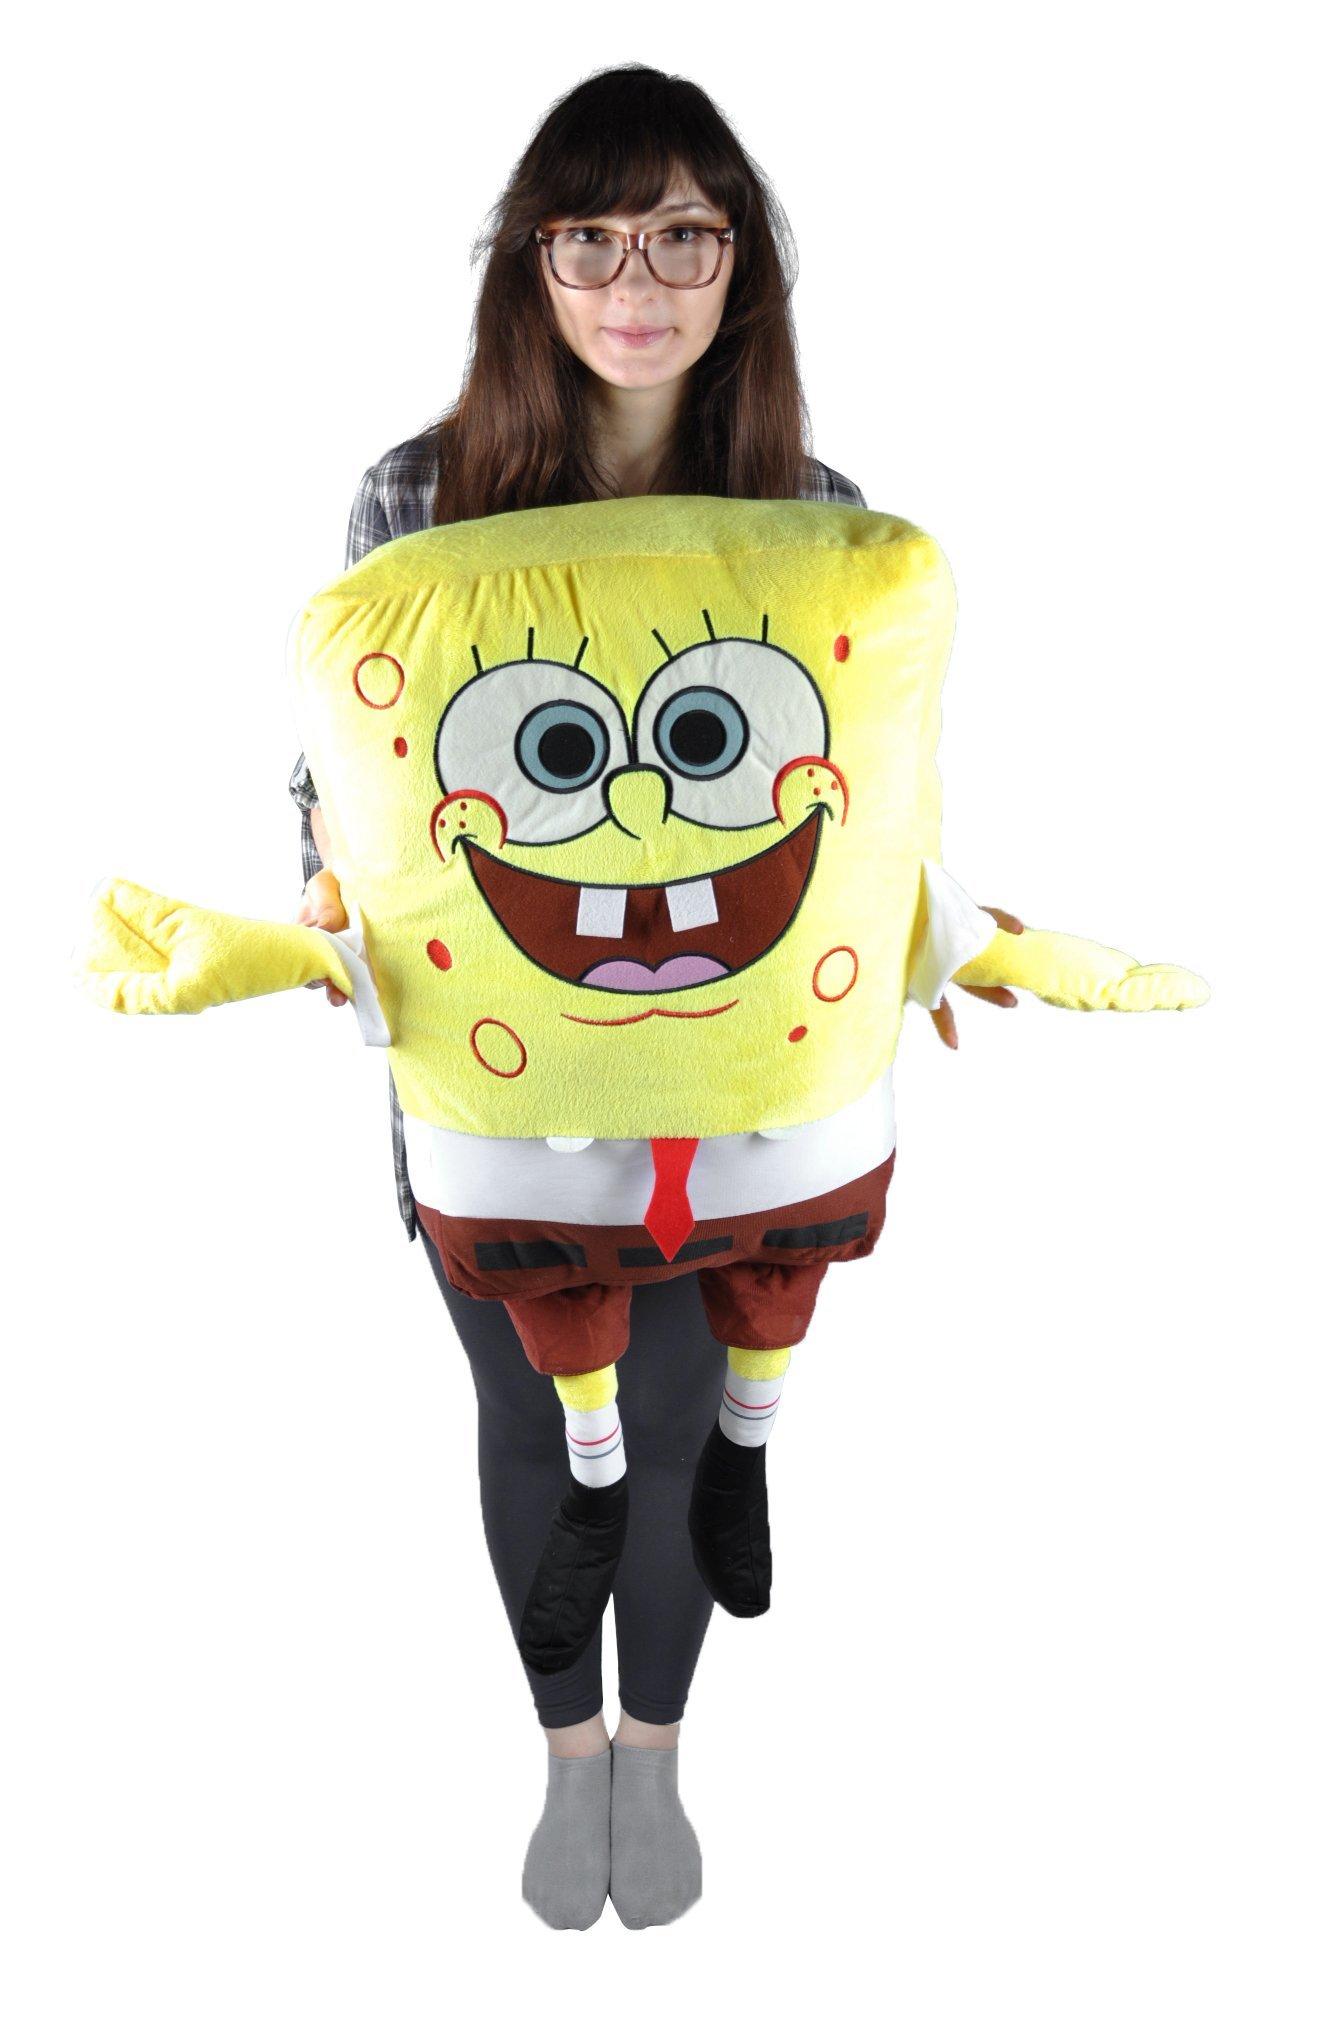 Gift Story Large Size 39 Inch /100cm Spongebob Squarepants Plush Stuffed Soft Toy by Gift Story